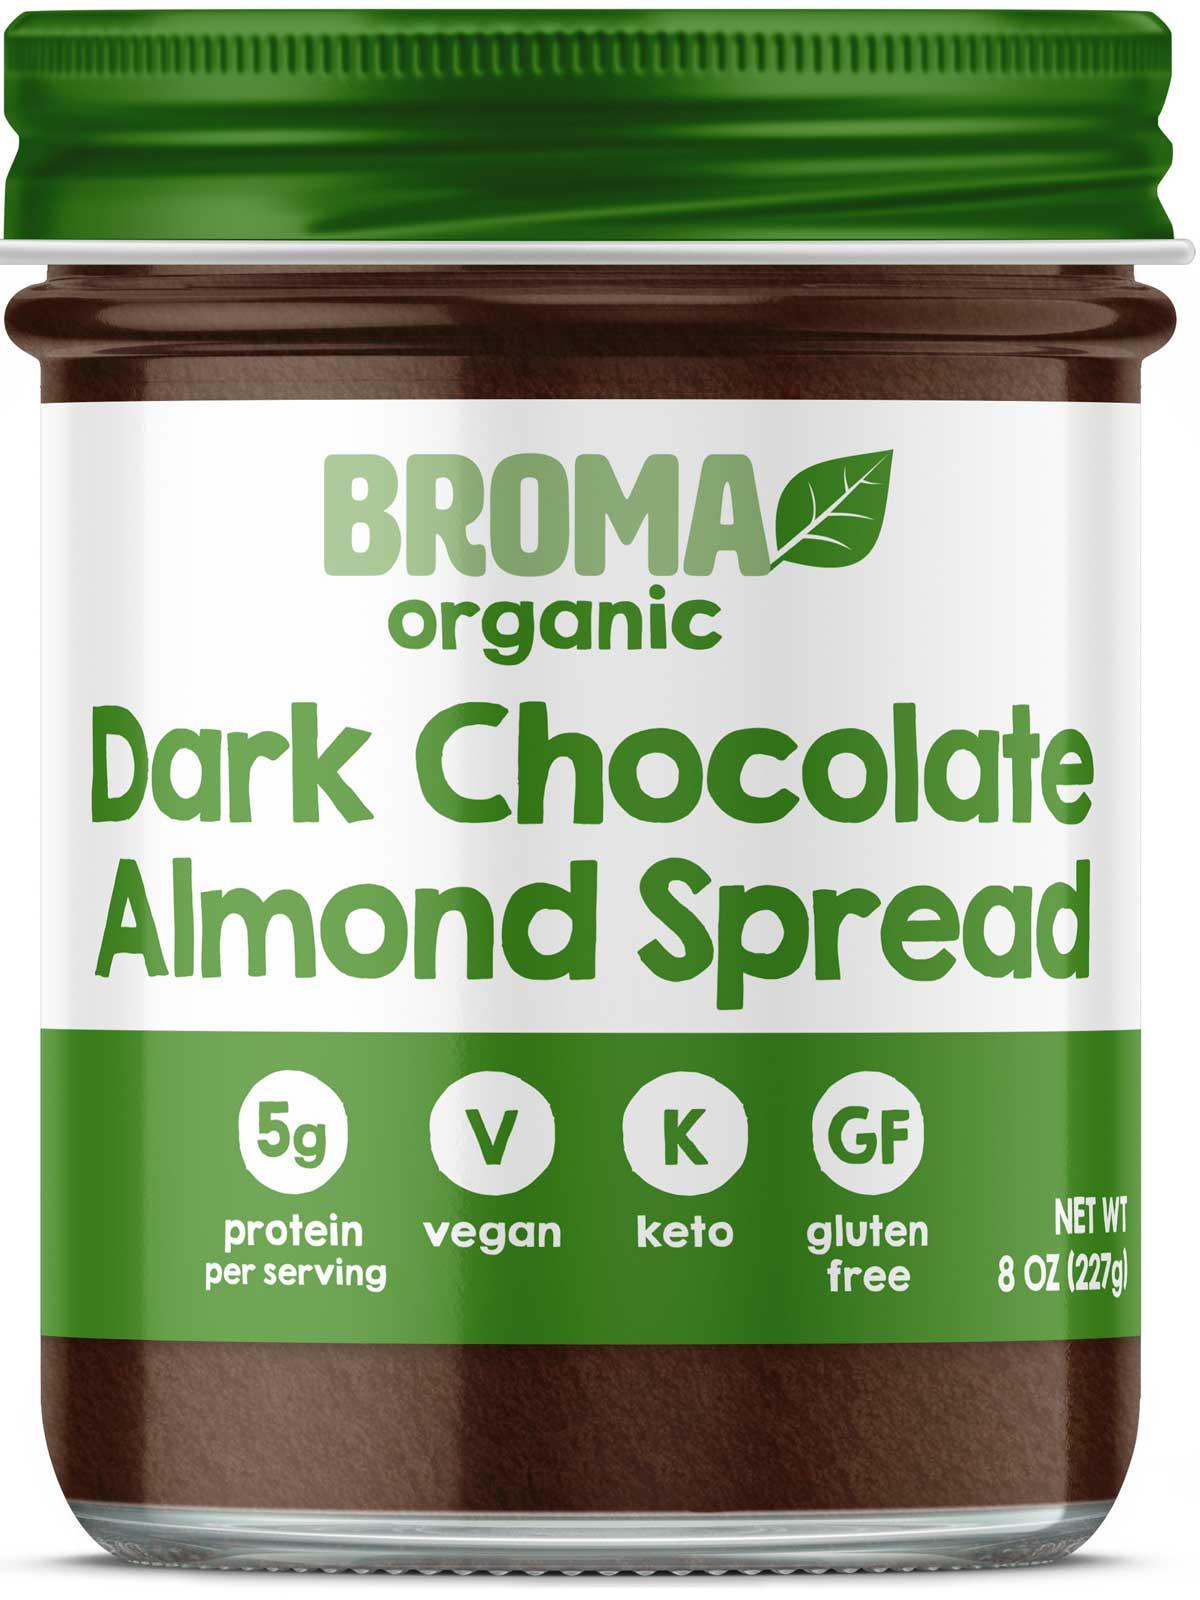 Broma Dark Chocolate Almond Spread